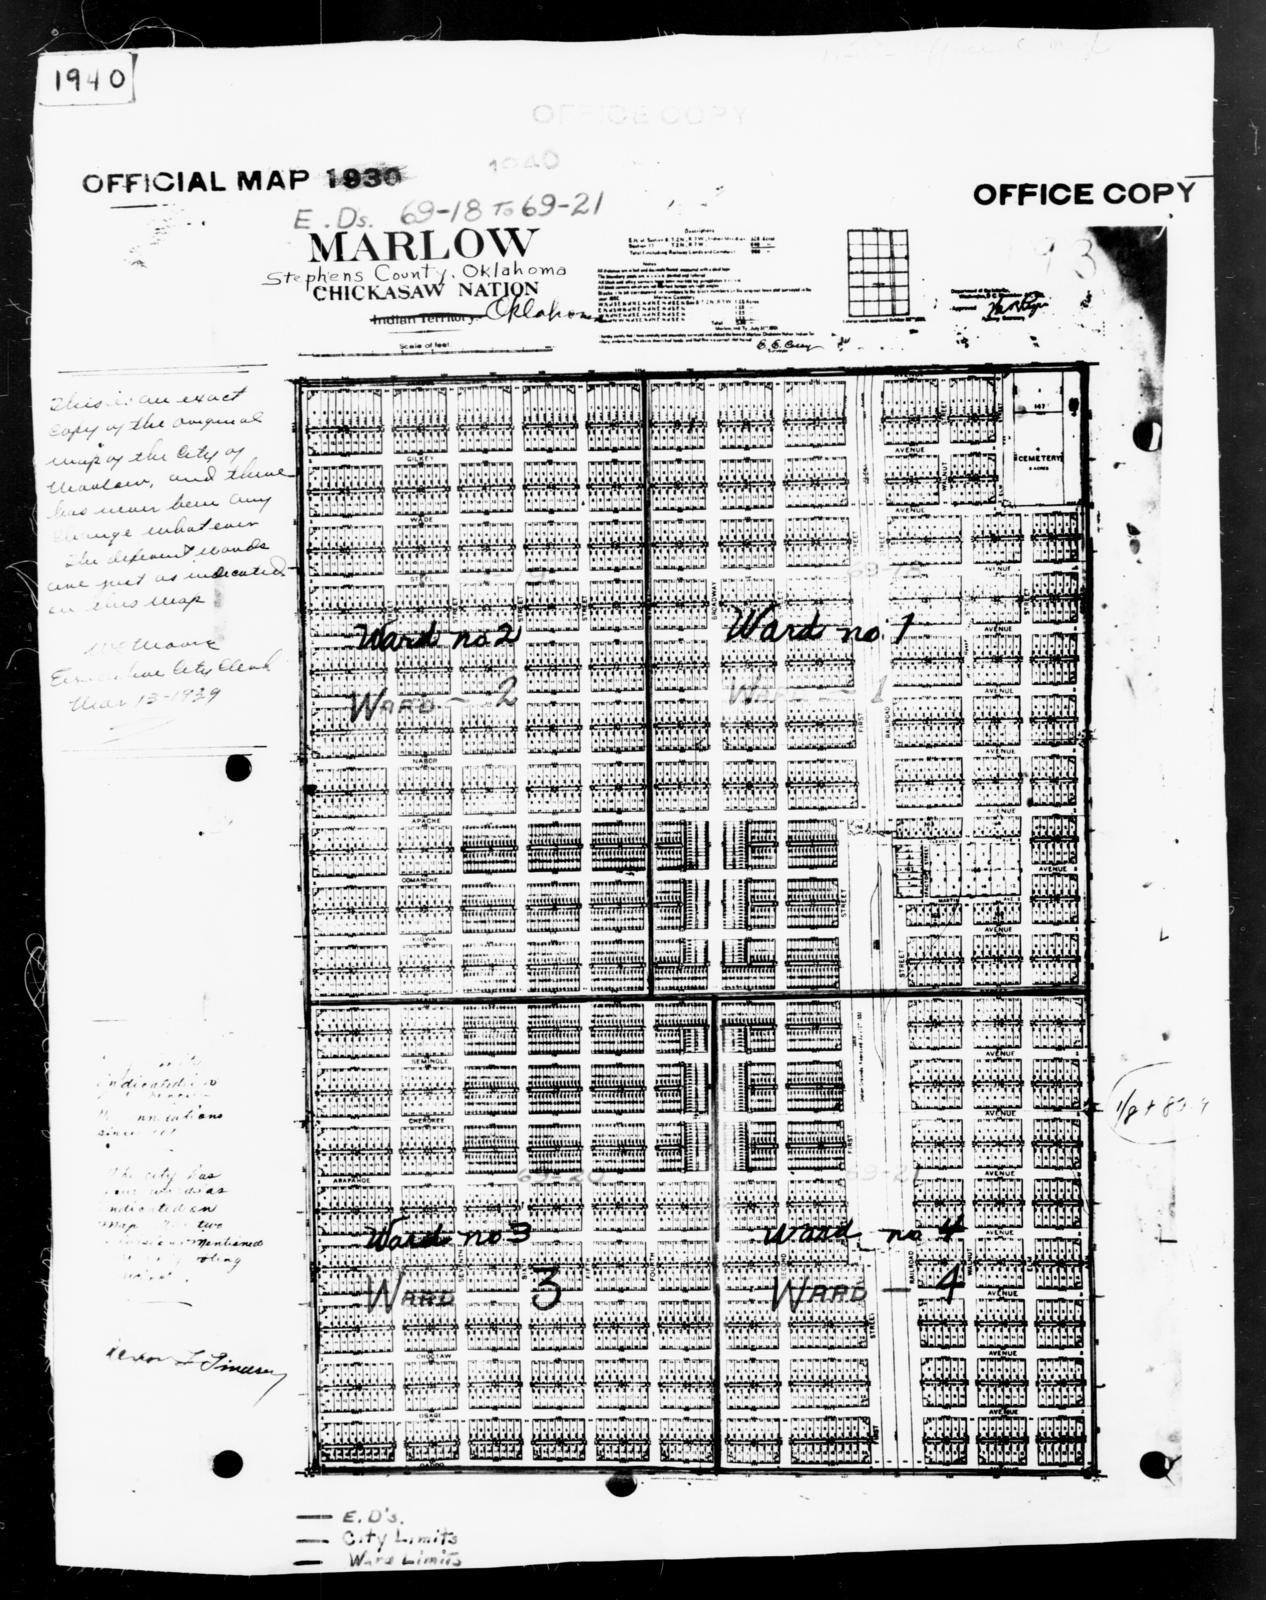 1940 Census Enumeration District Maps Oklahoma Stephens County